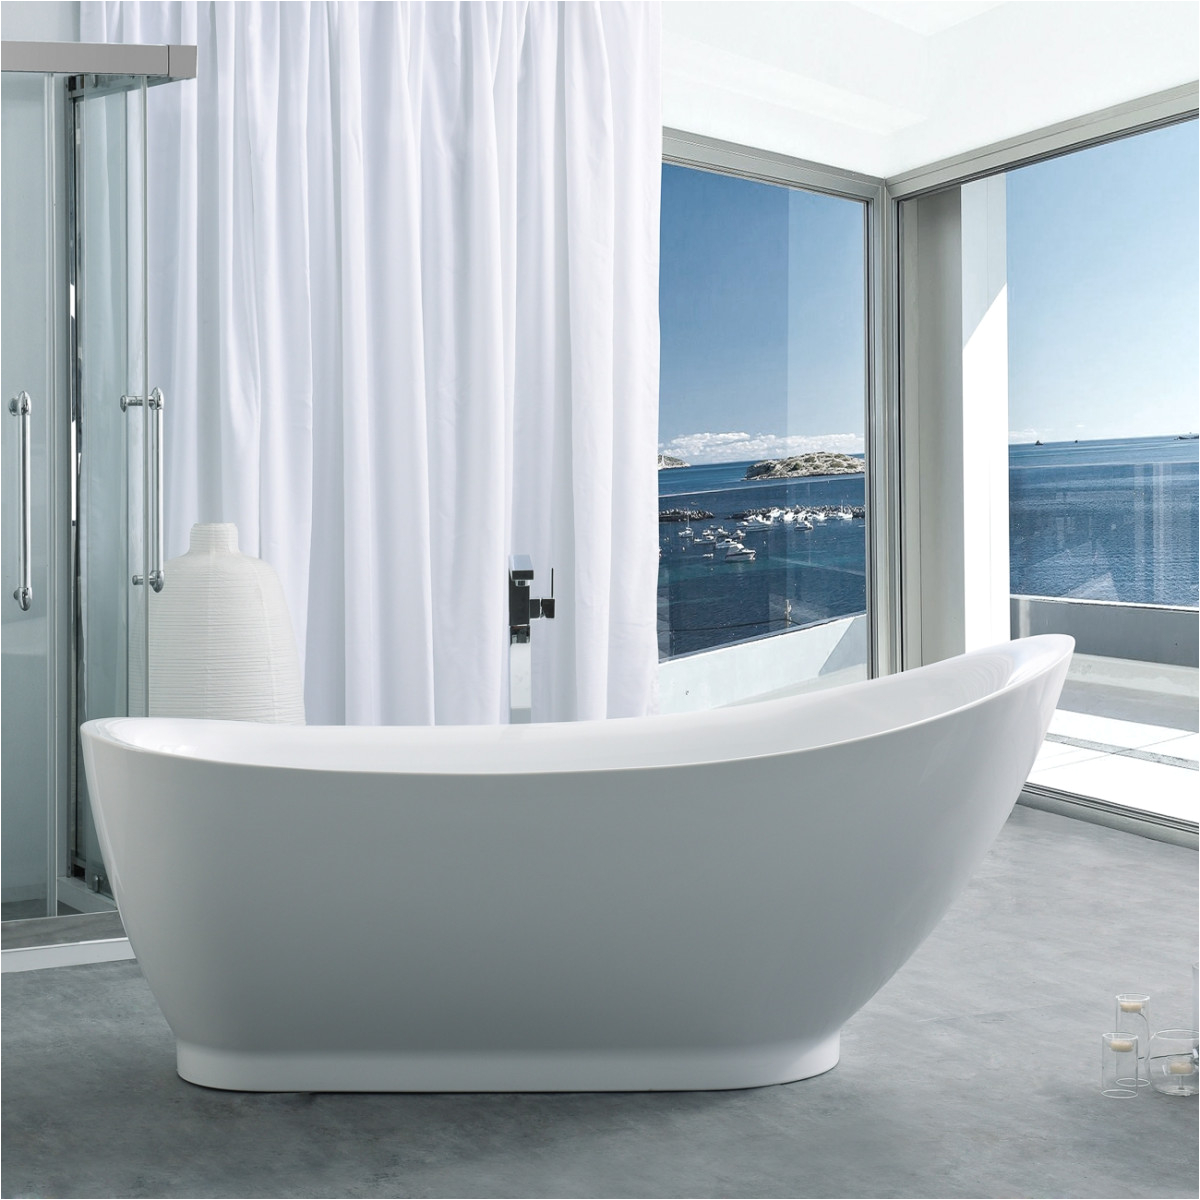 randolph morris 71 inch acrylic slipper freestanding tub no faucet drillings rmj13 s